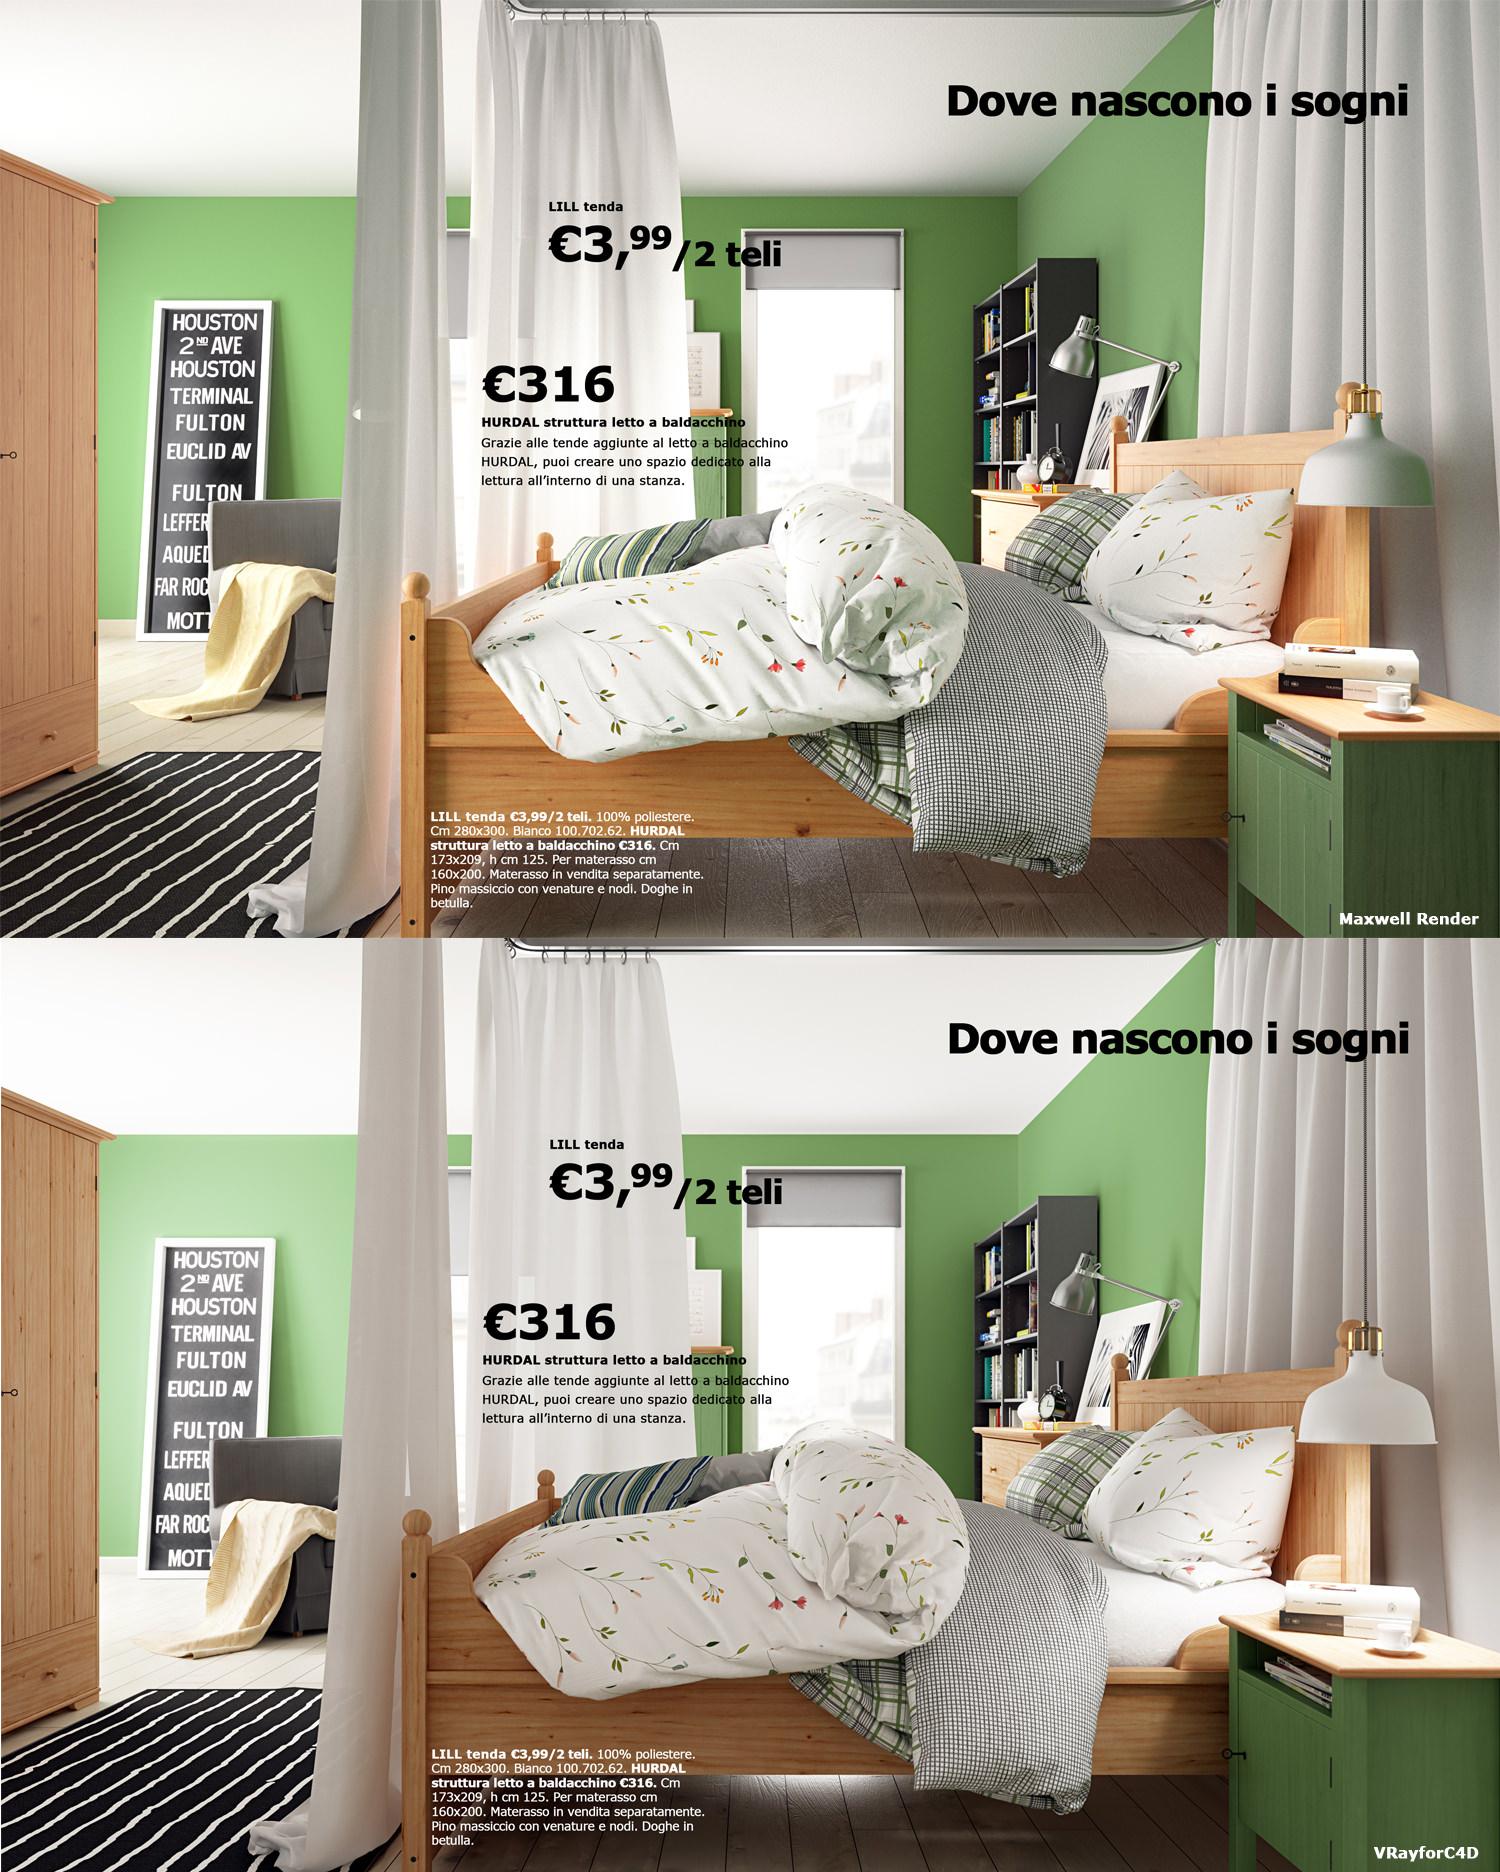 Letto Ikea A Baldacchino.Ikea Scene Vrayforc4d Vs Maxwell Render 3dtotal Forums